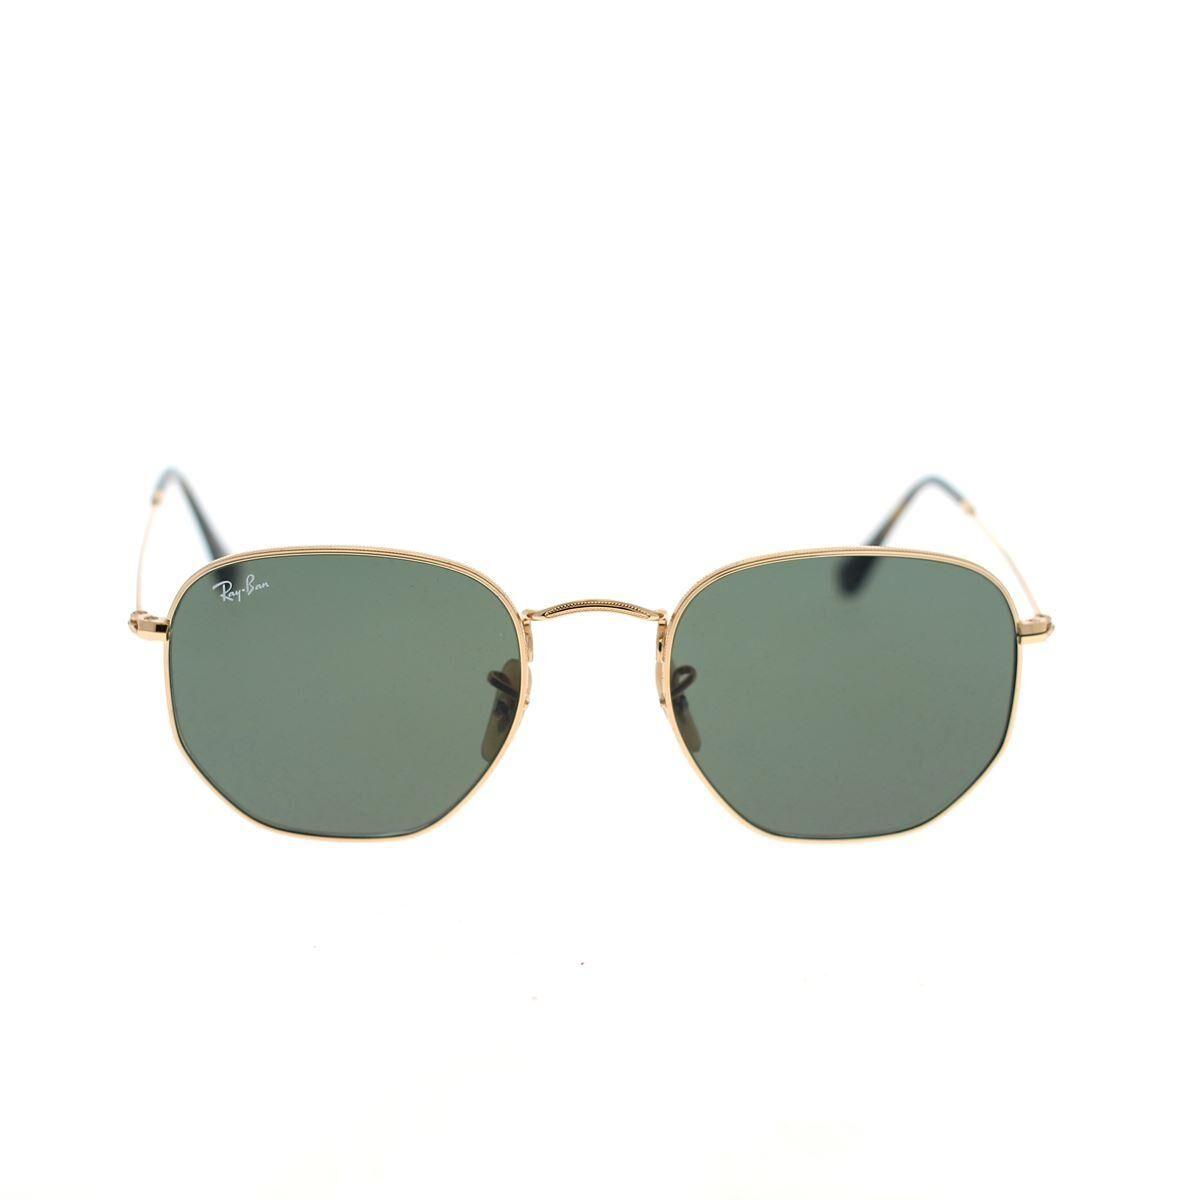 ray-ban occhiali da sole hexagonal rb3548n 001